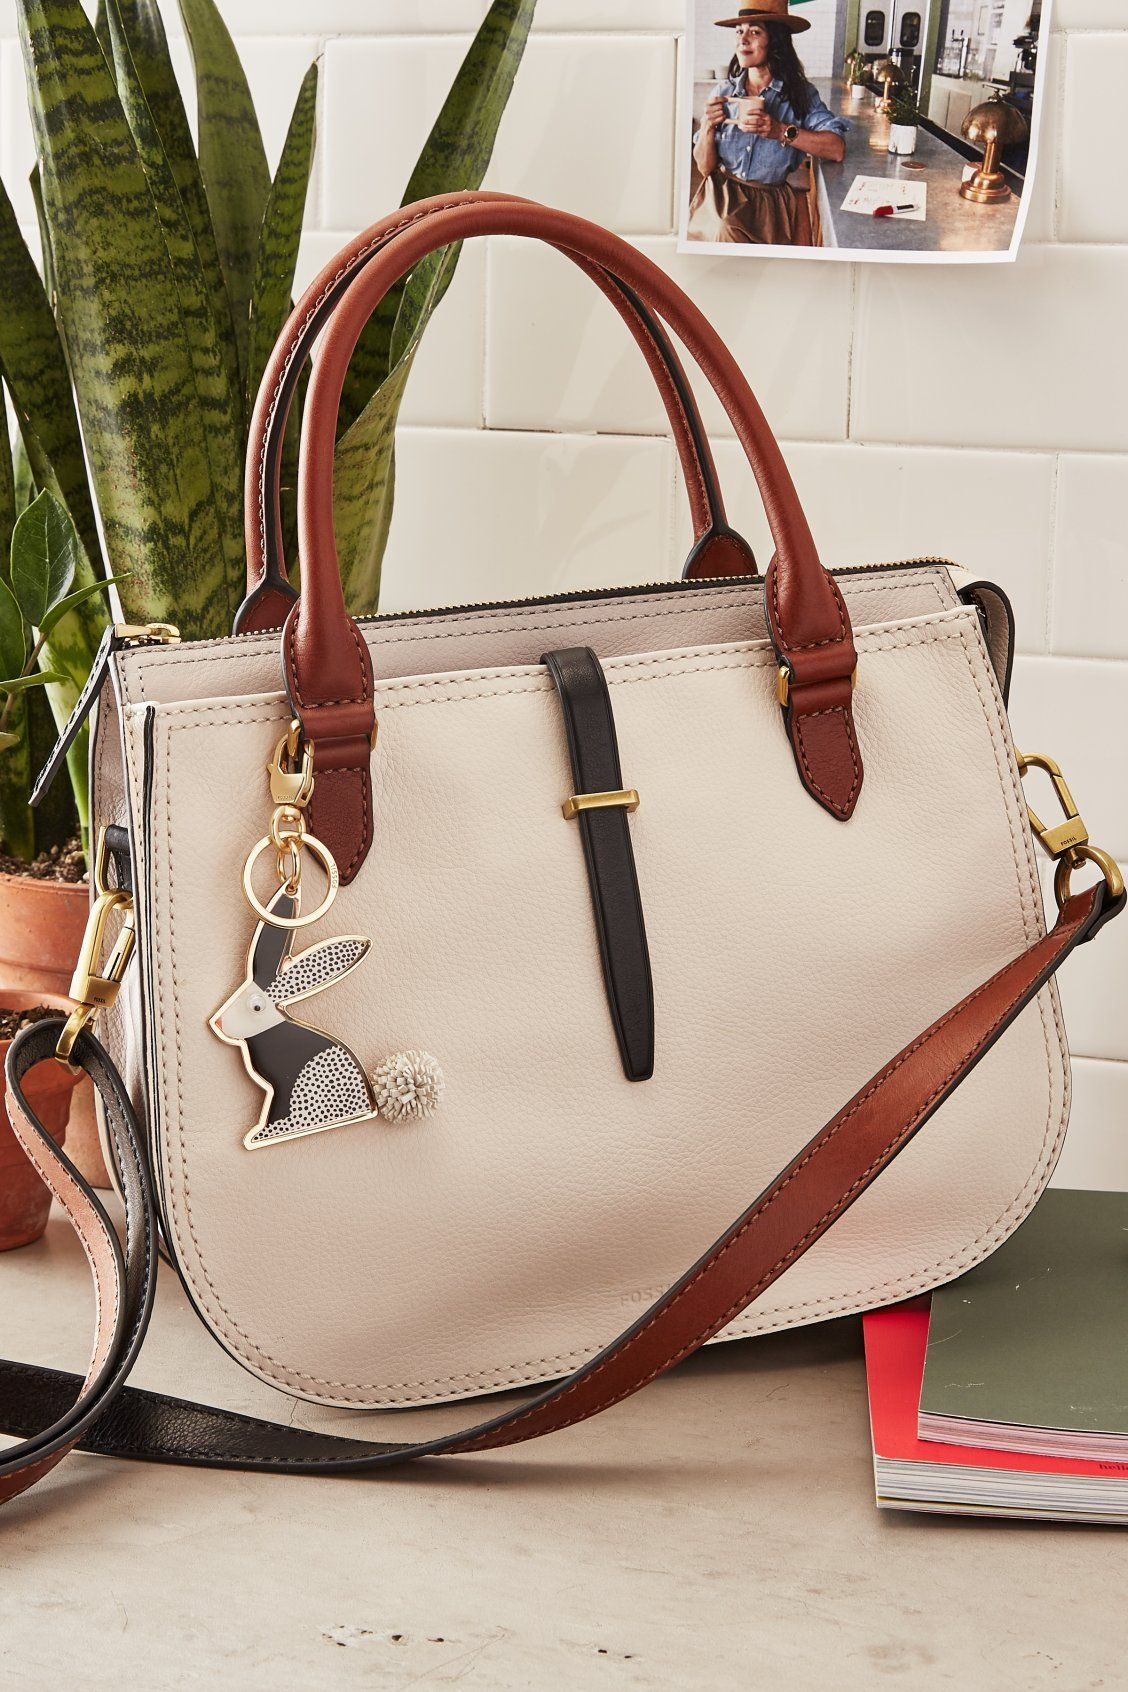 403ae96df3 Ryder Satchel | bags | Fossil handbags, Purses, bags, Bags